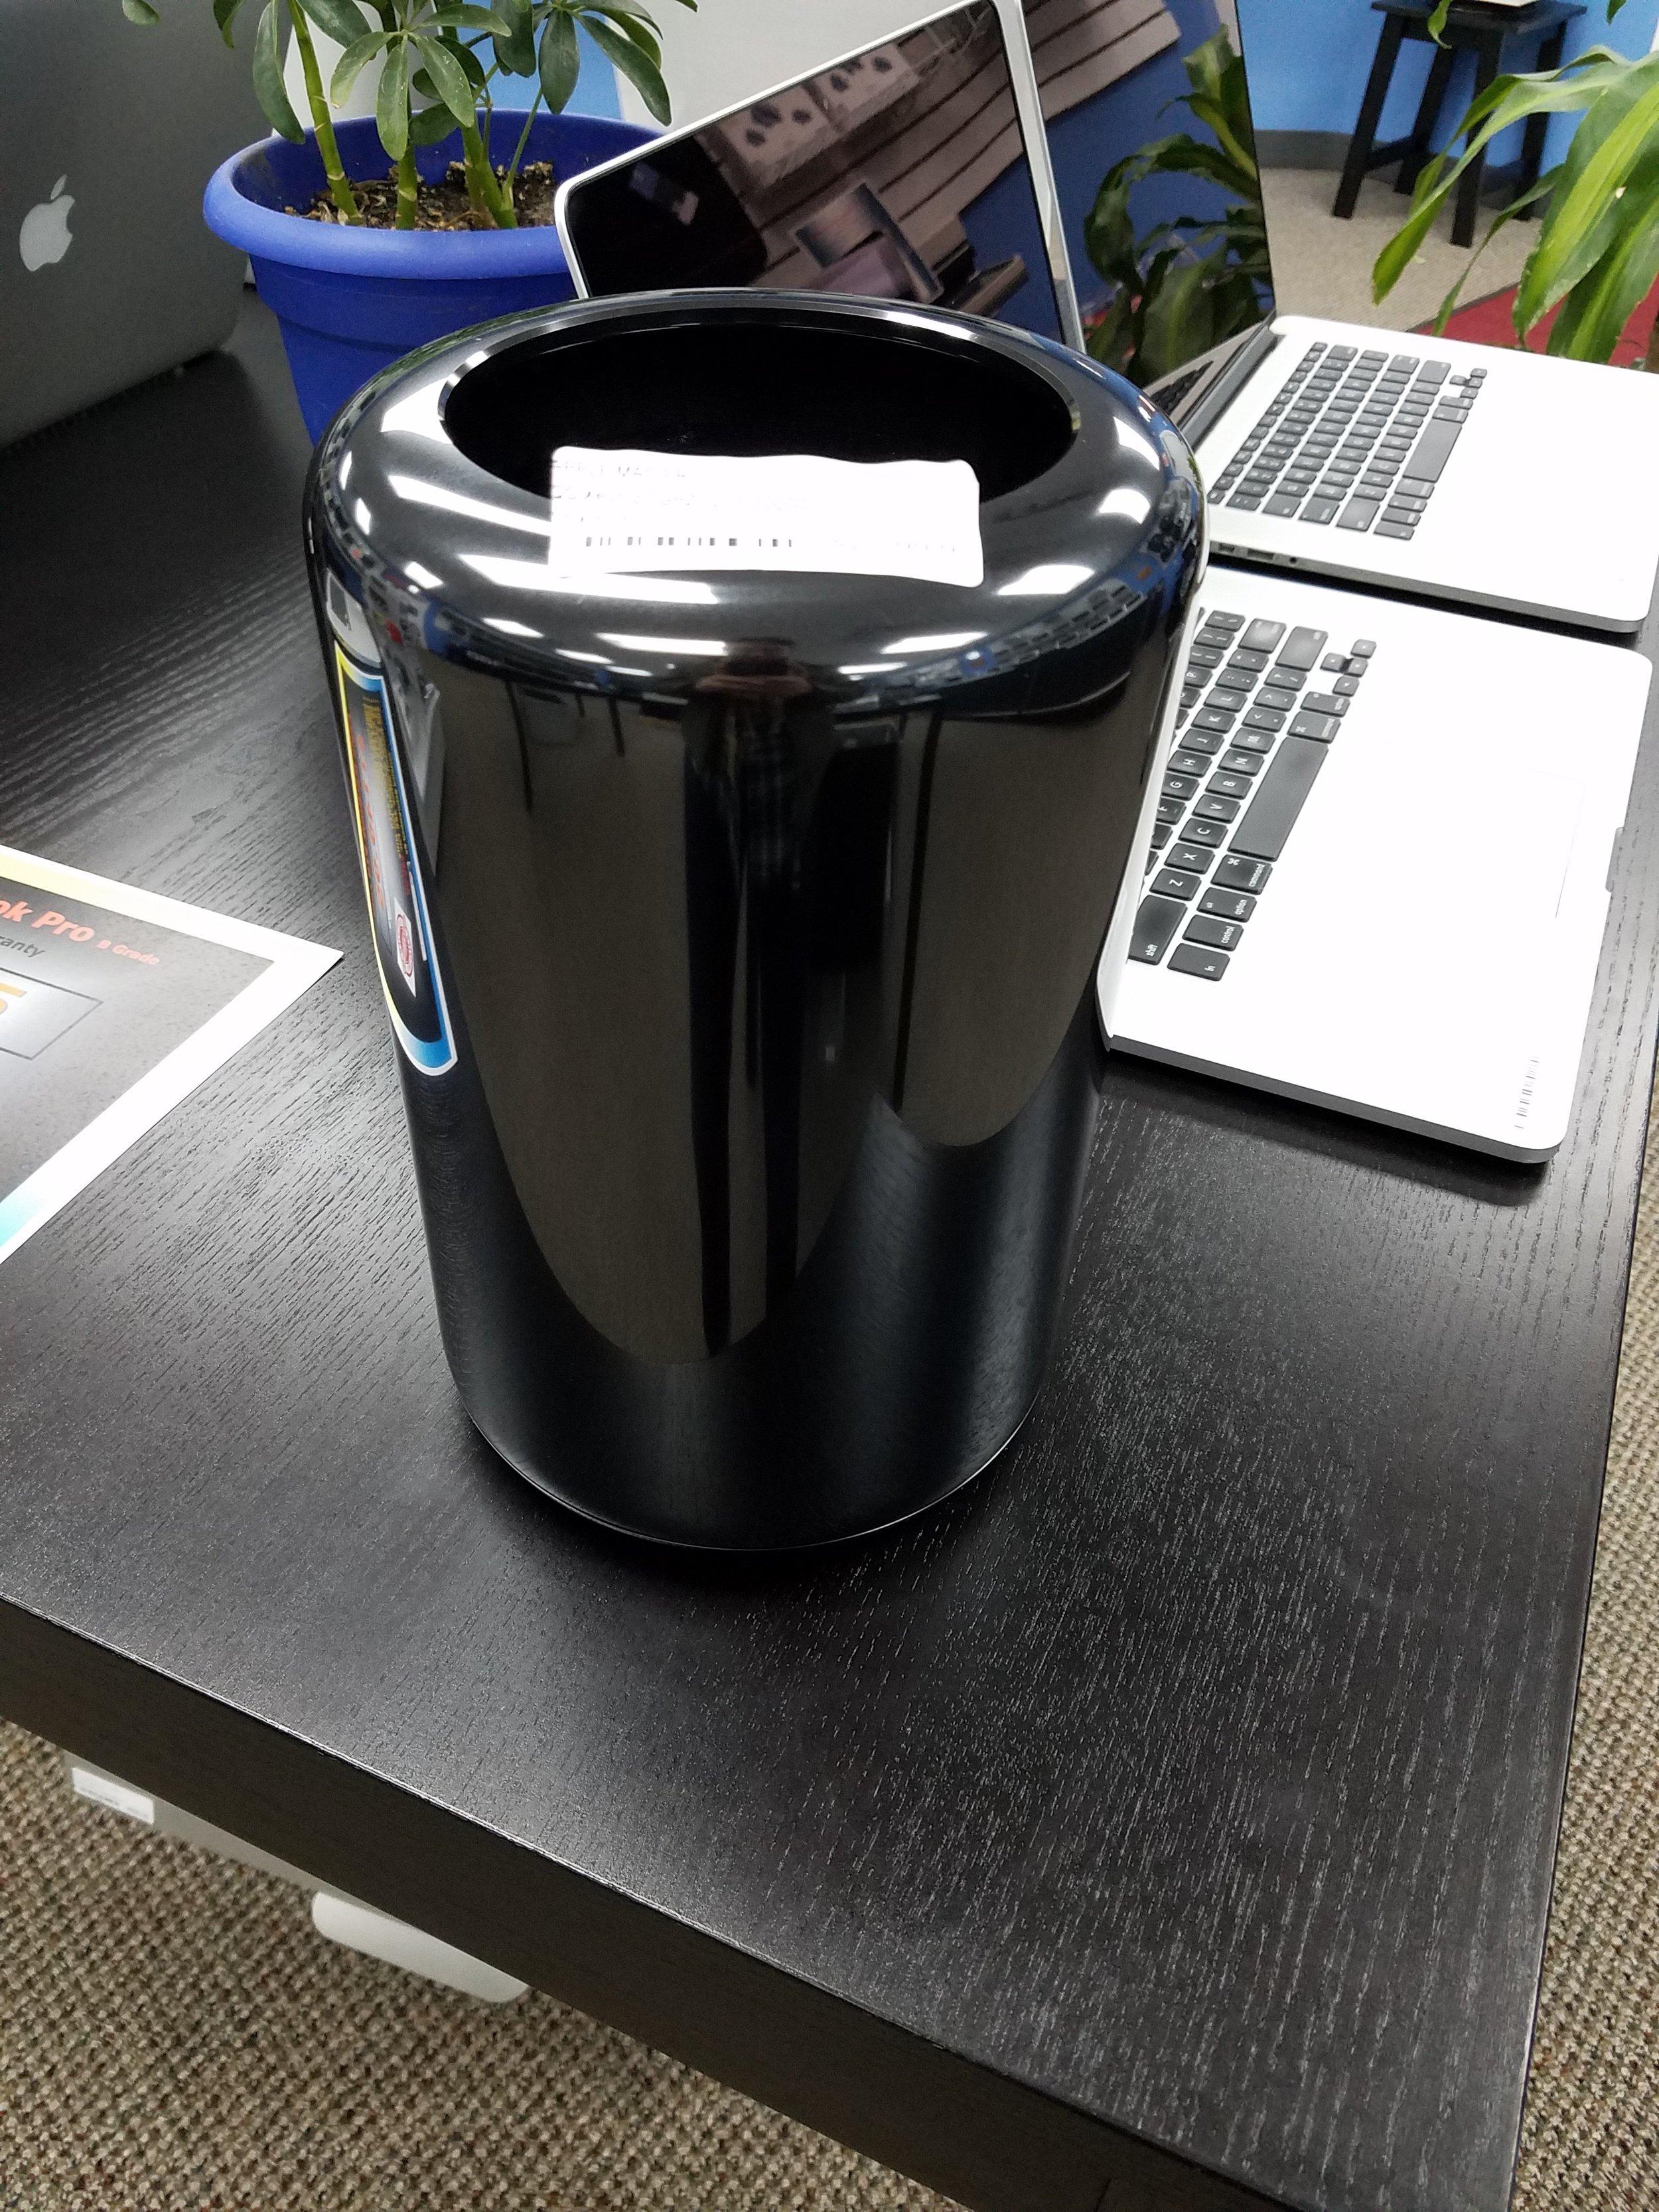 Apple Mac Pro.jpg